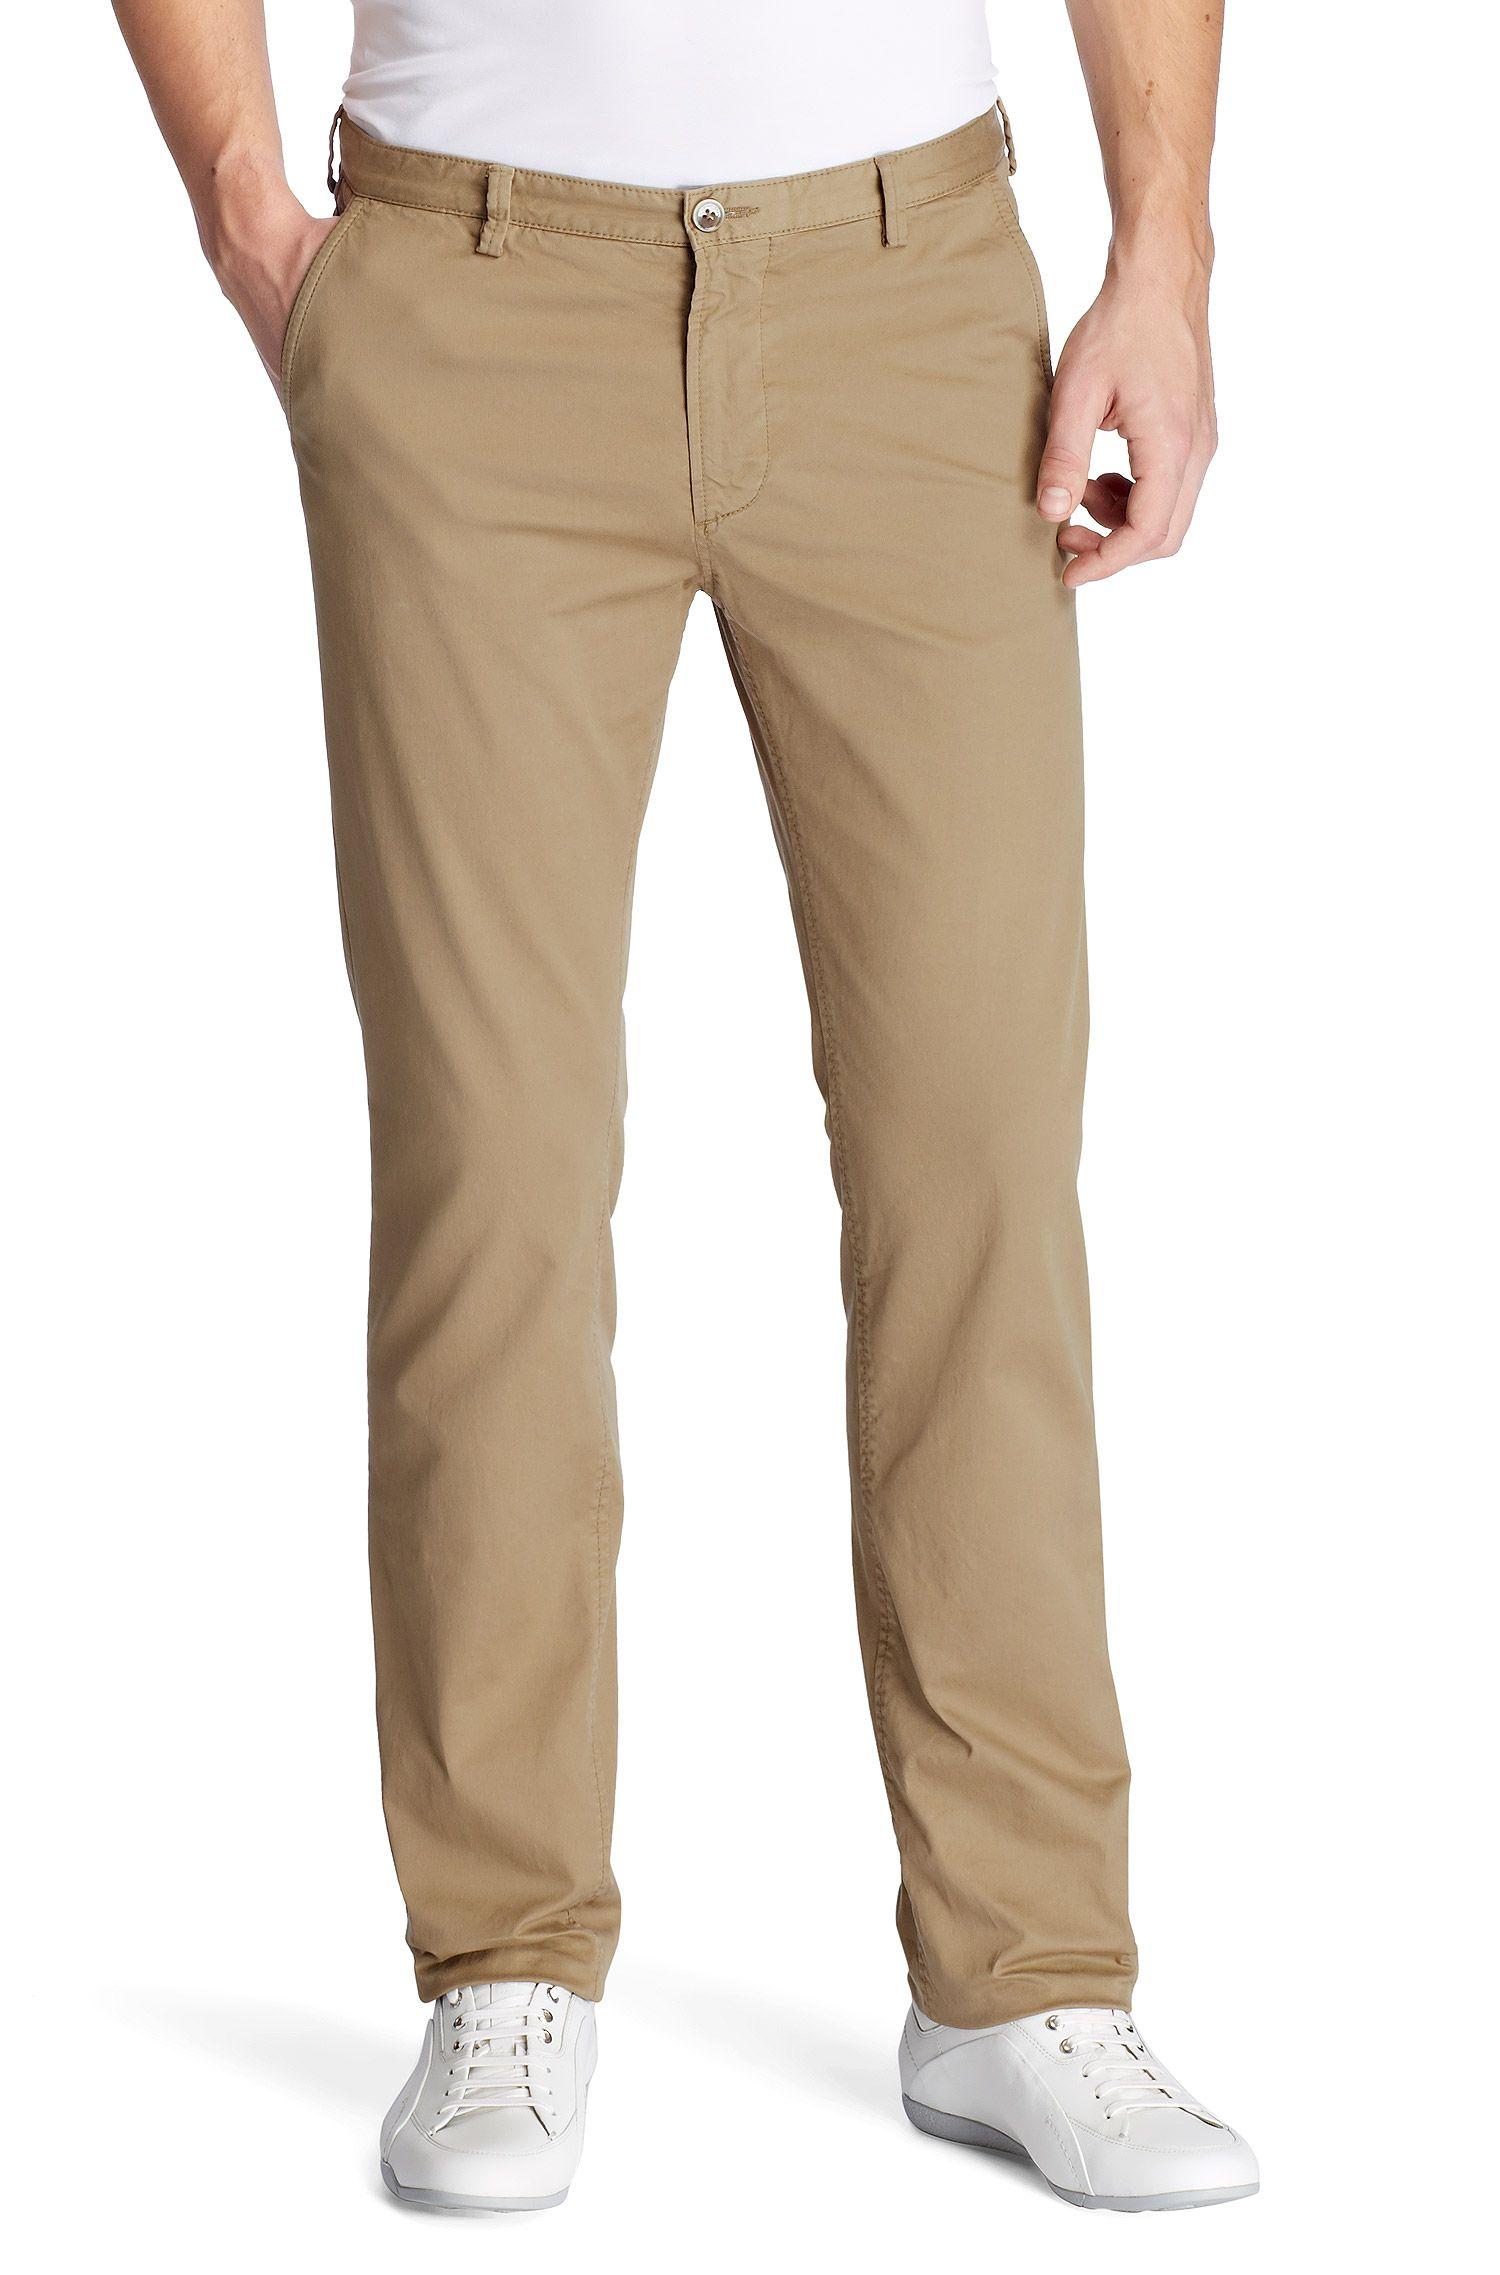 Pantalon de loisirs Slim Fit «Rice-1-D modern essential»